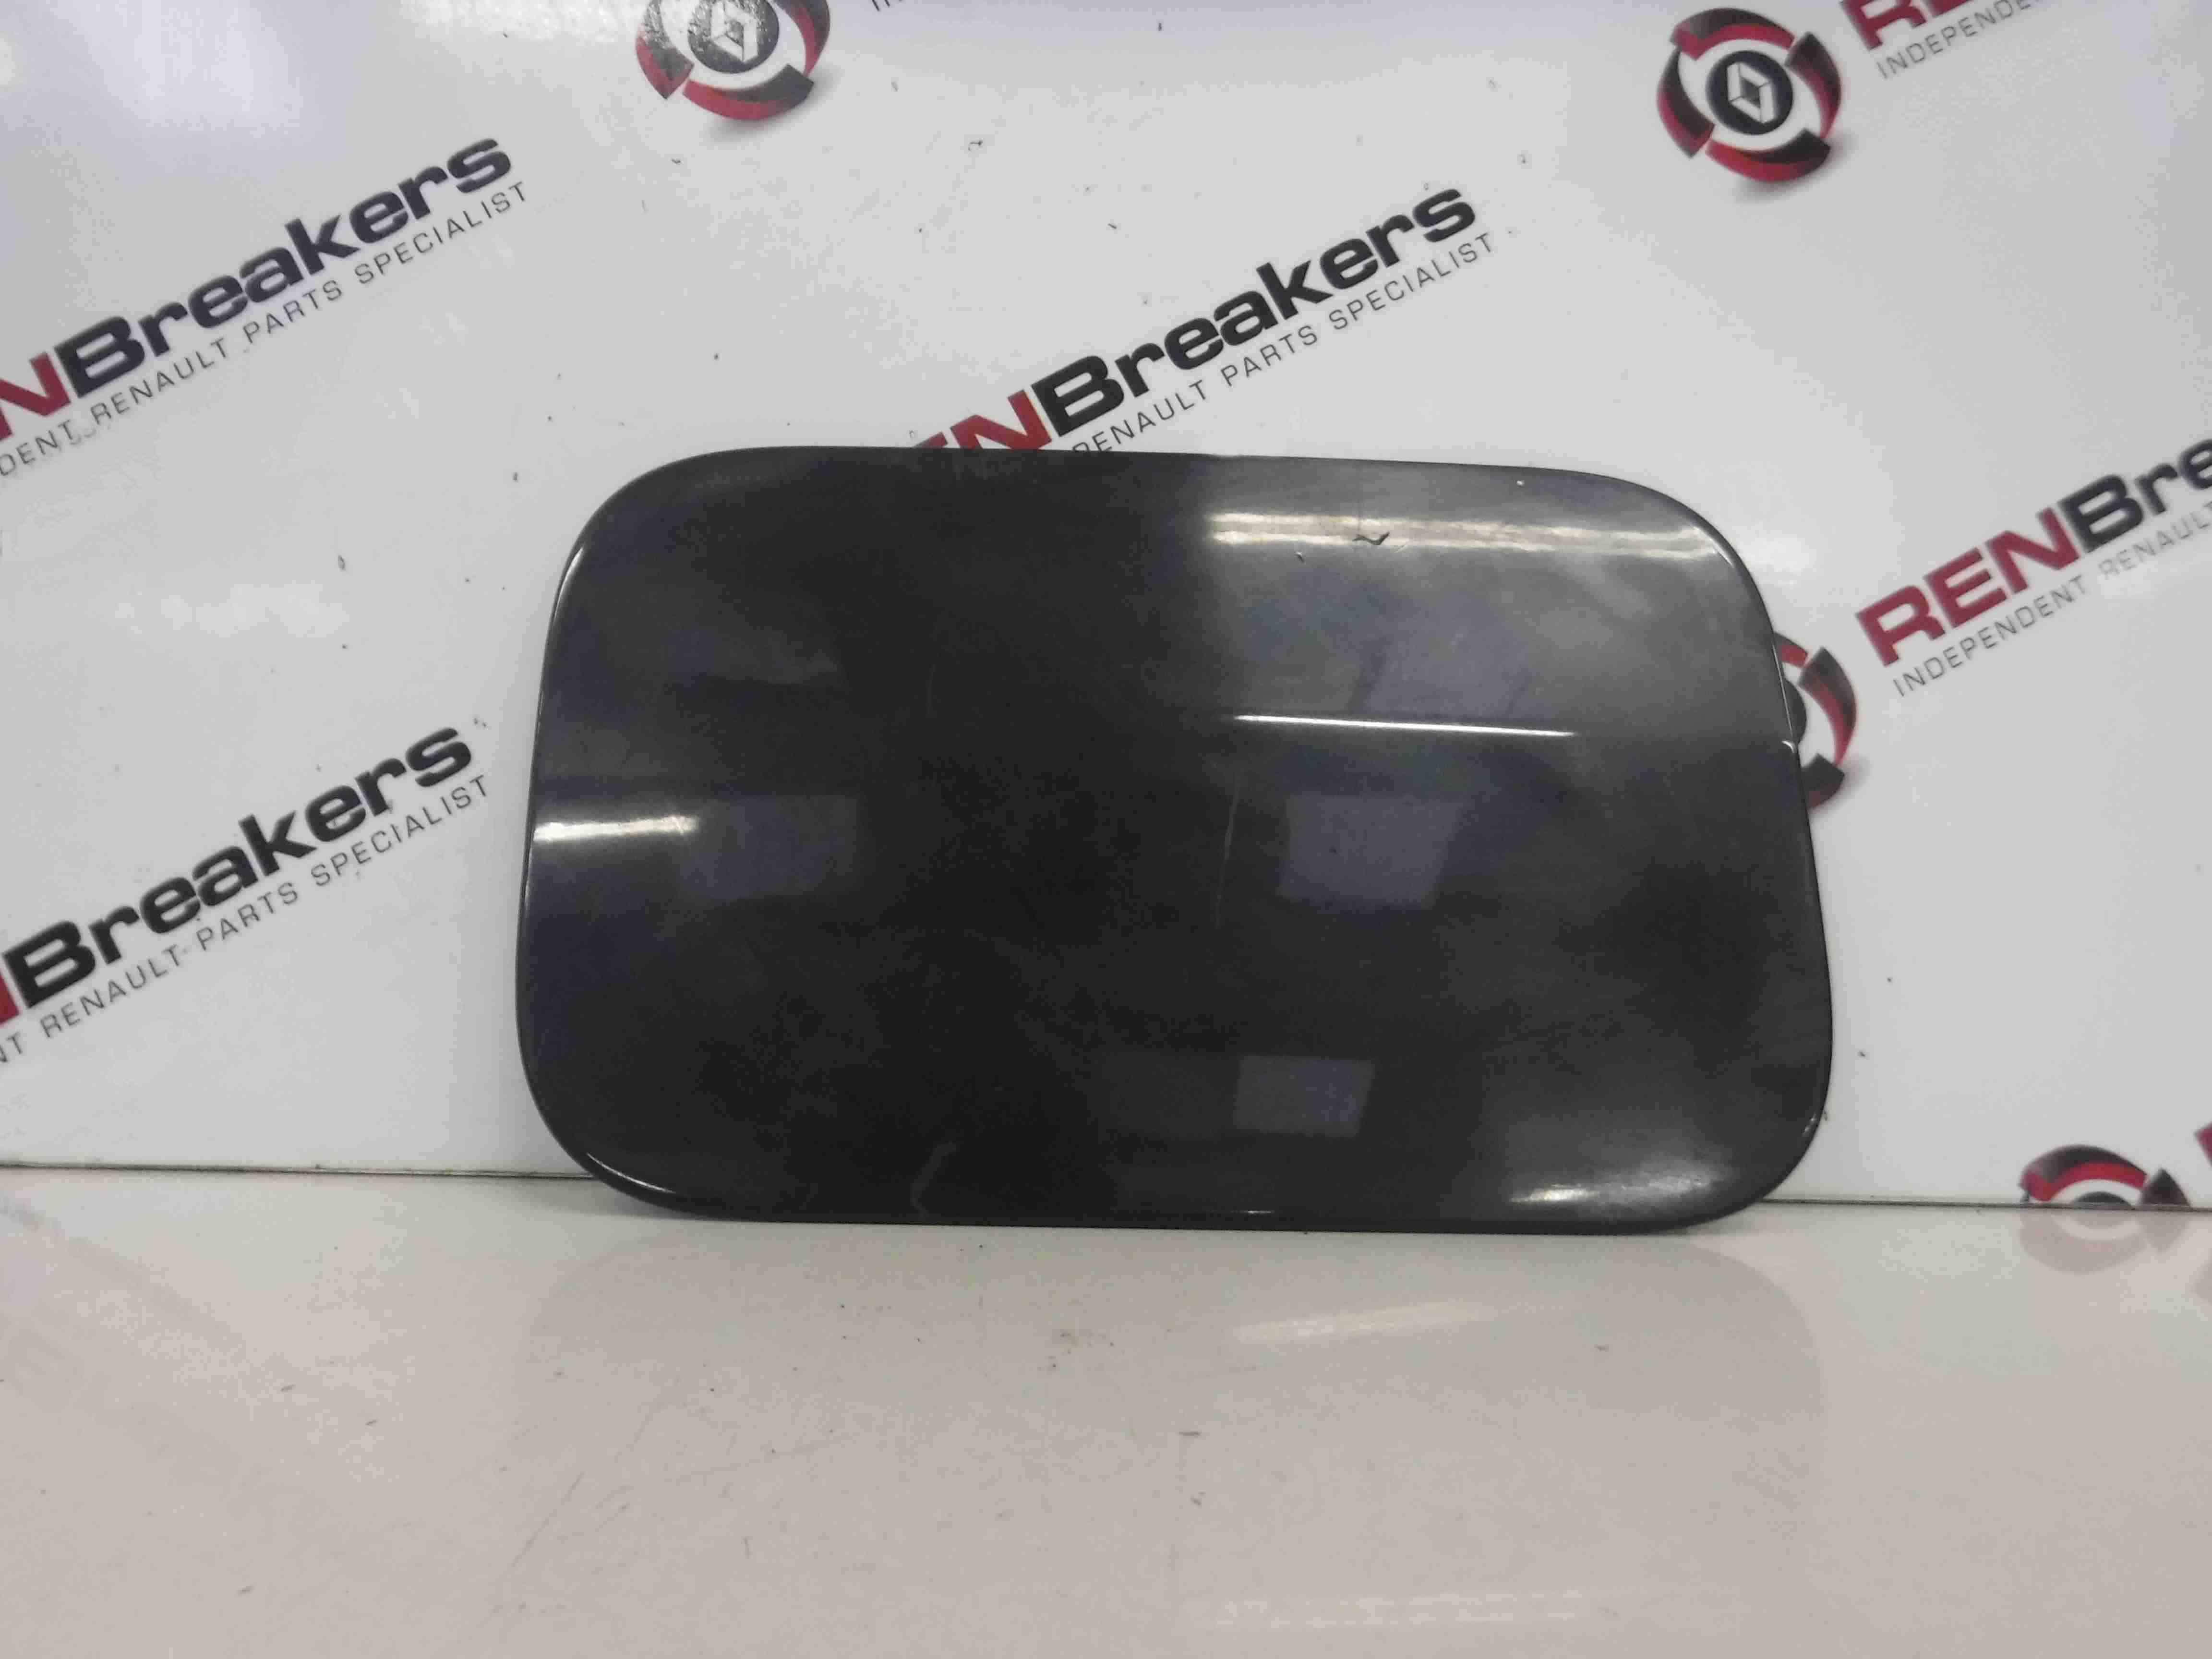 Renault Megane Scenic 2003-2009 Fuel Flap Cover Black 676 8200228509 8200139542